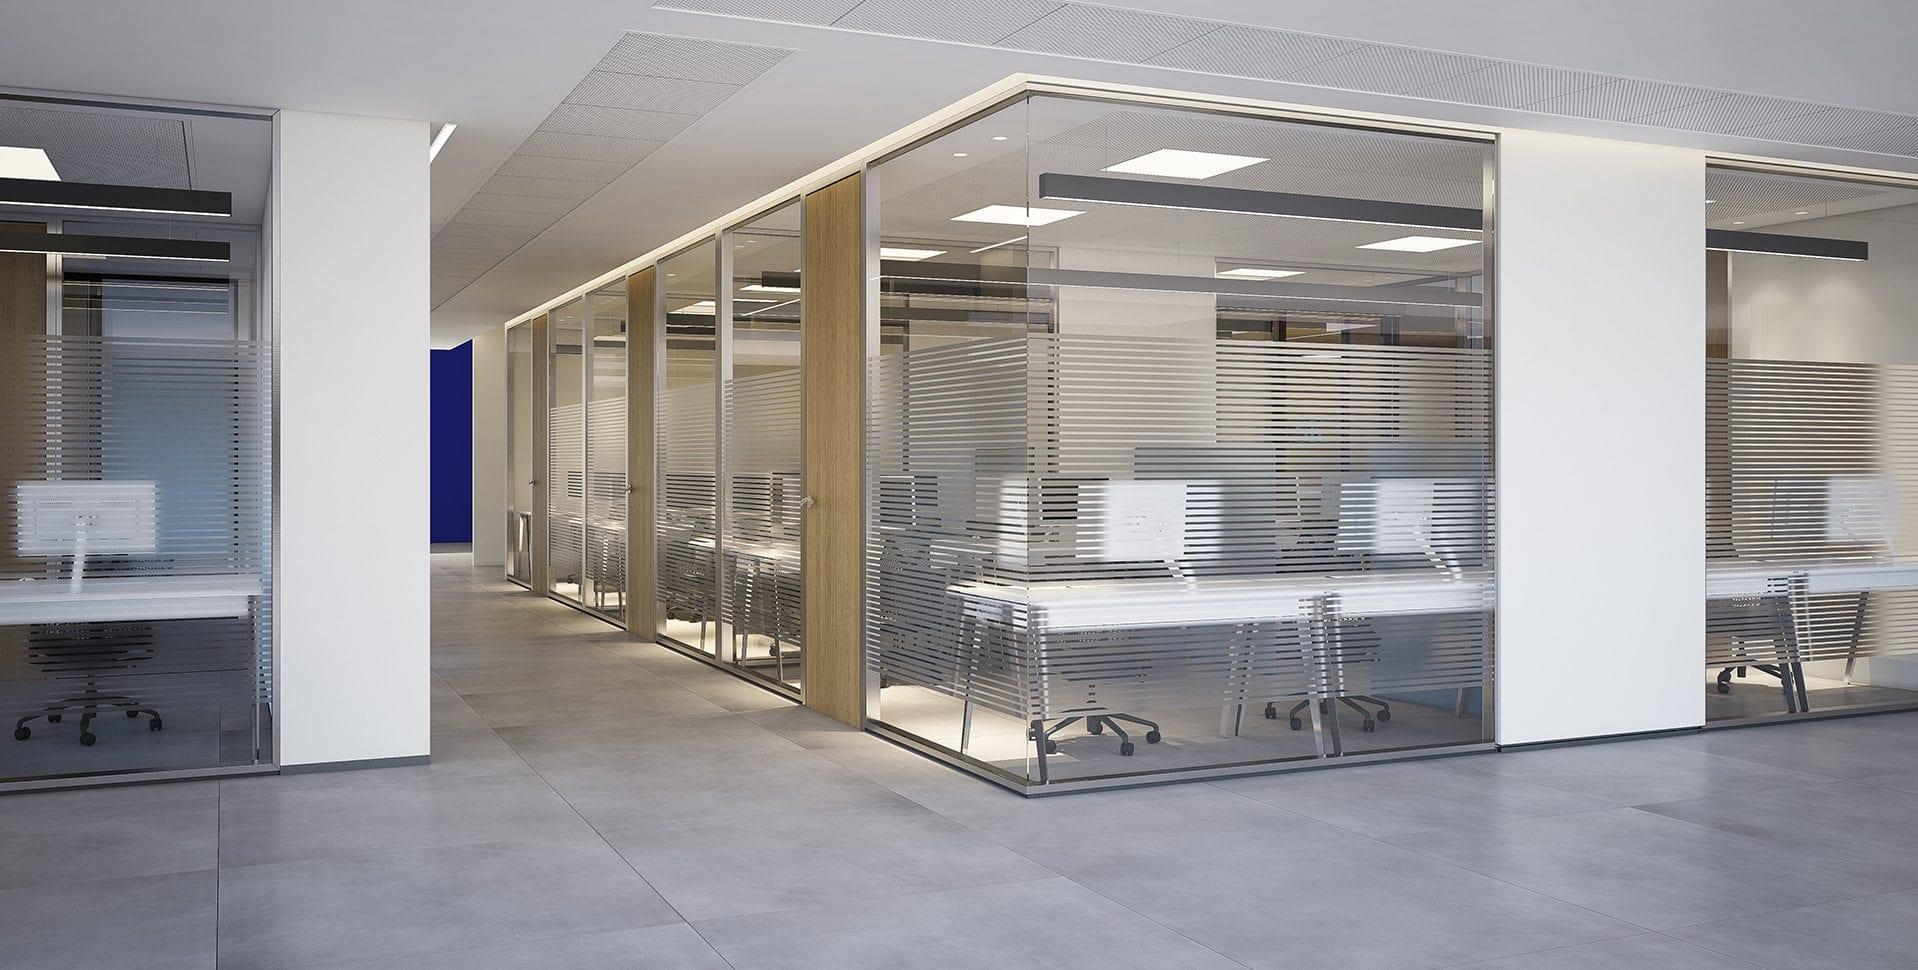 Maayan-Golan_Architectural-Visualization_ bdsk-office-visualization_meeting-room_design-dunski-architects_02